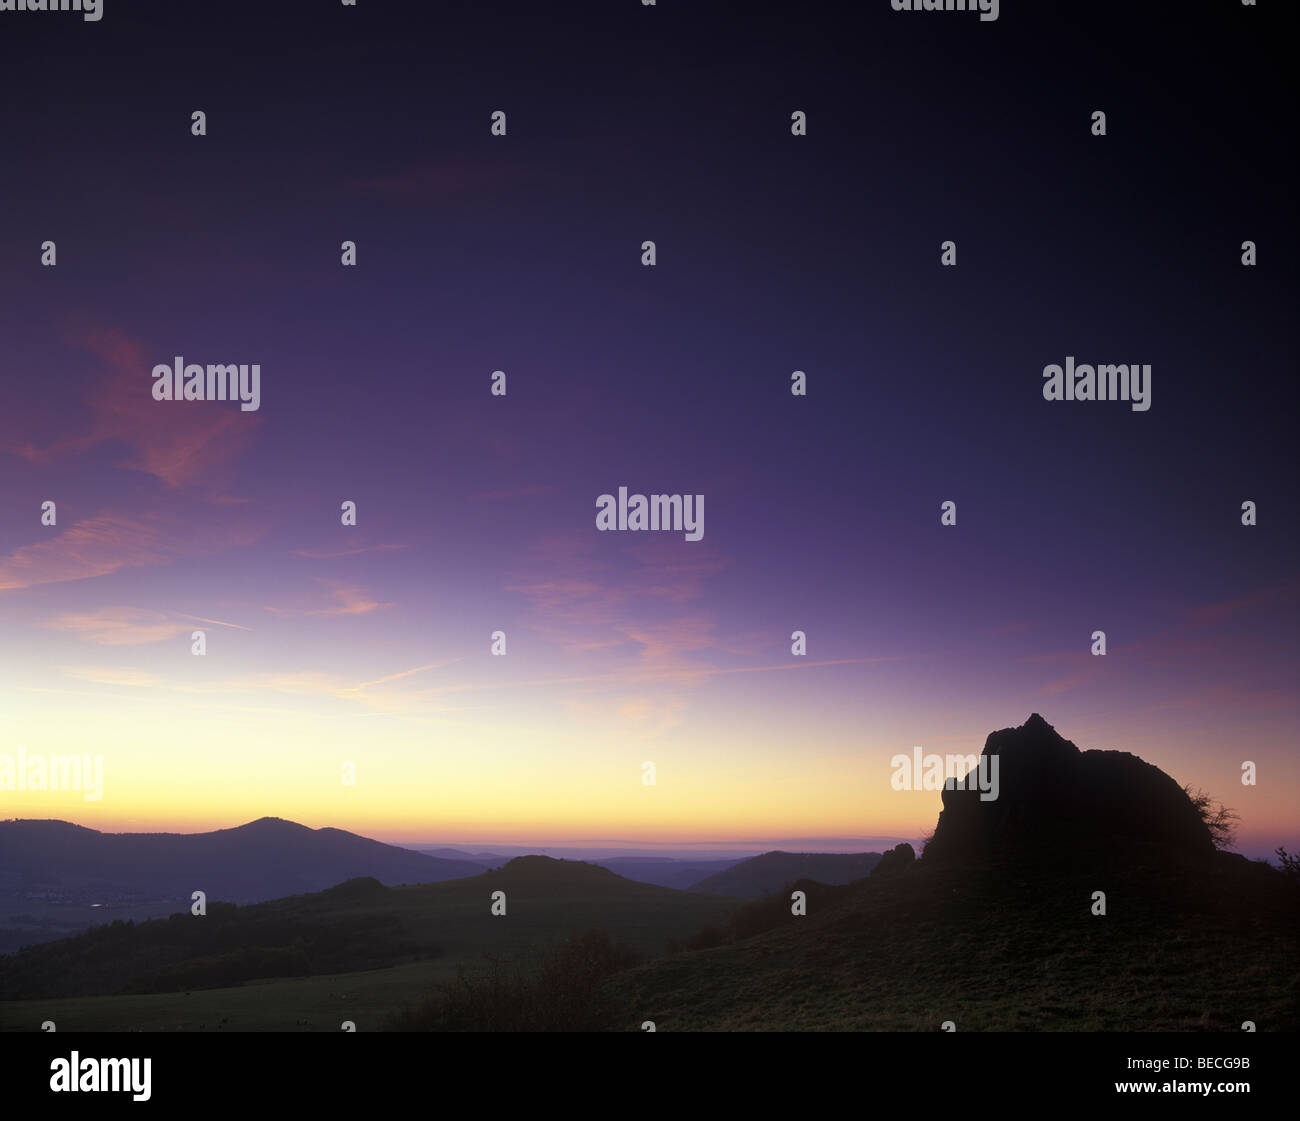 Helfensteine hills, Habichtswaeld mountainous basalt landscape, near Kassel, Hesse, Germany, Europe - Stock Image